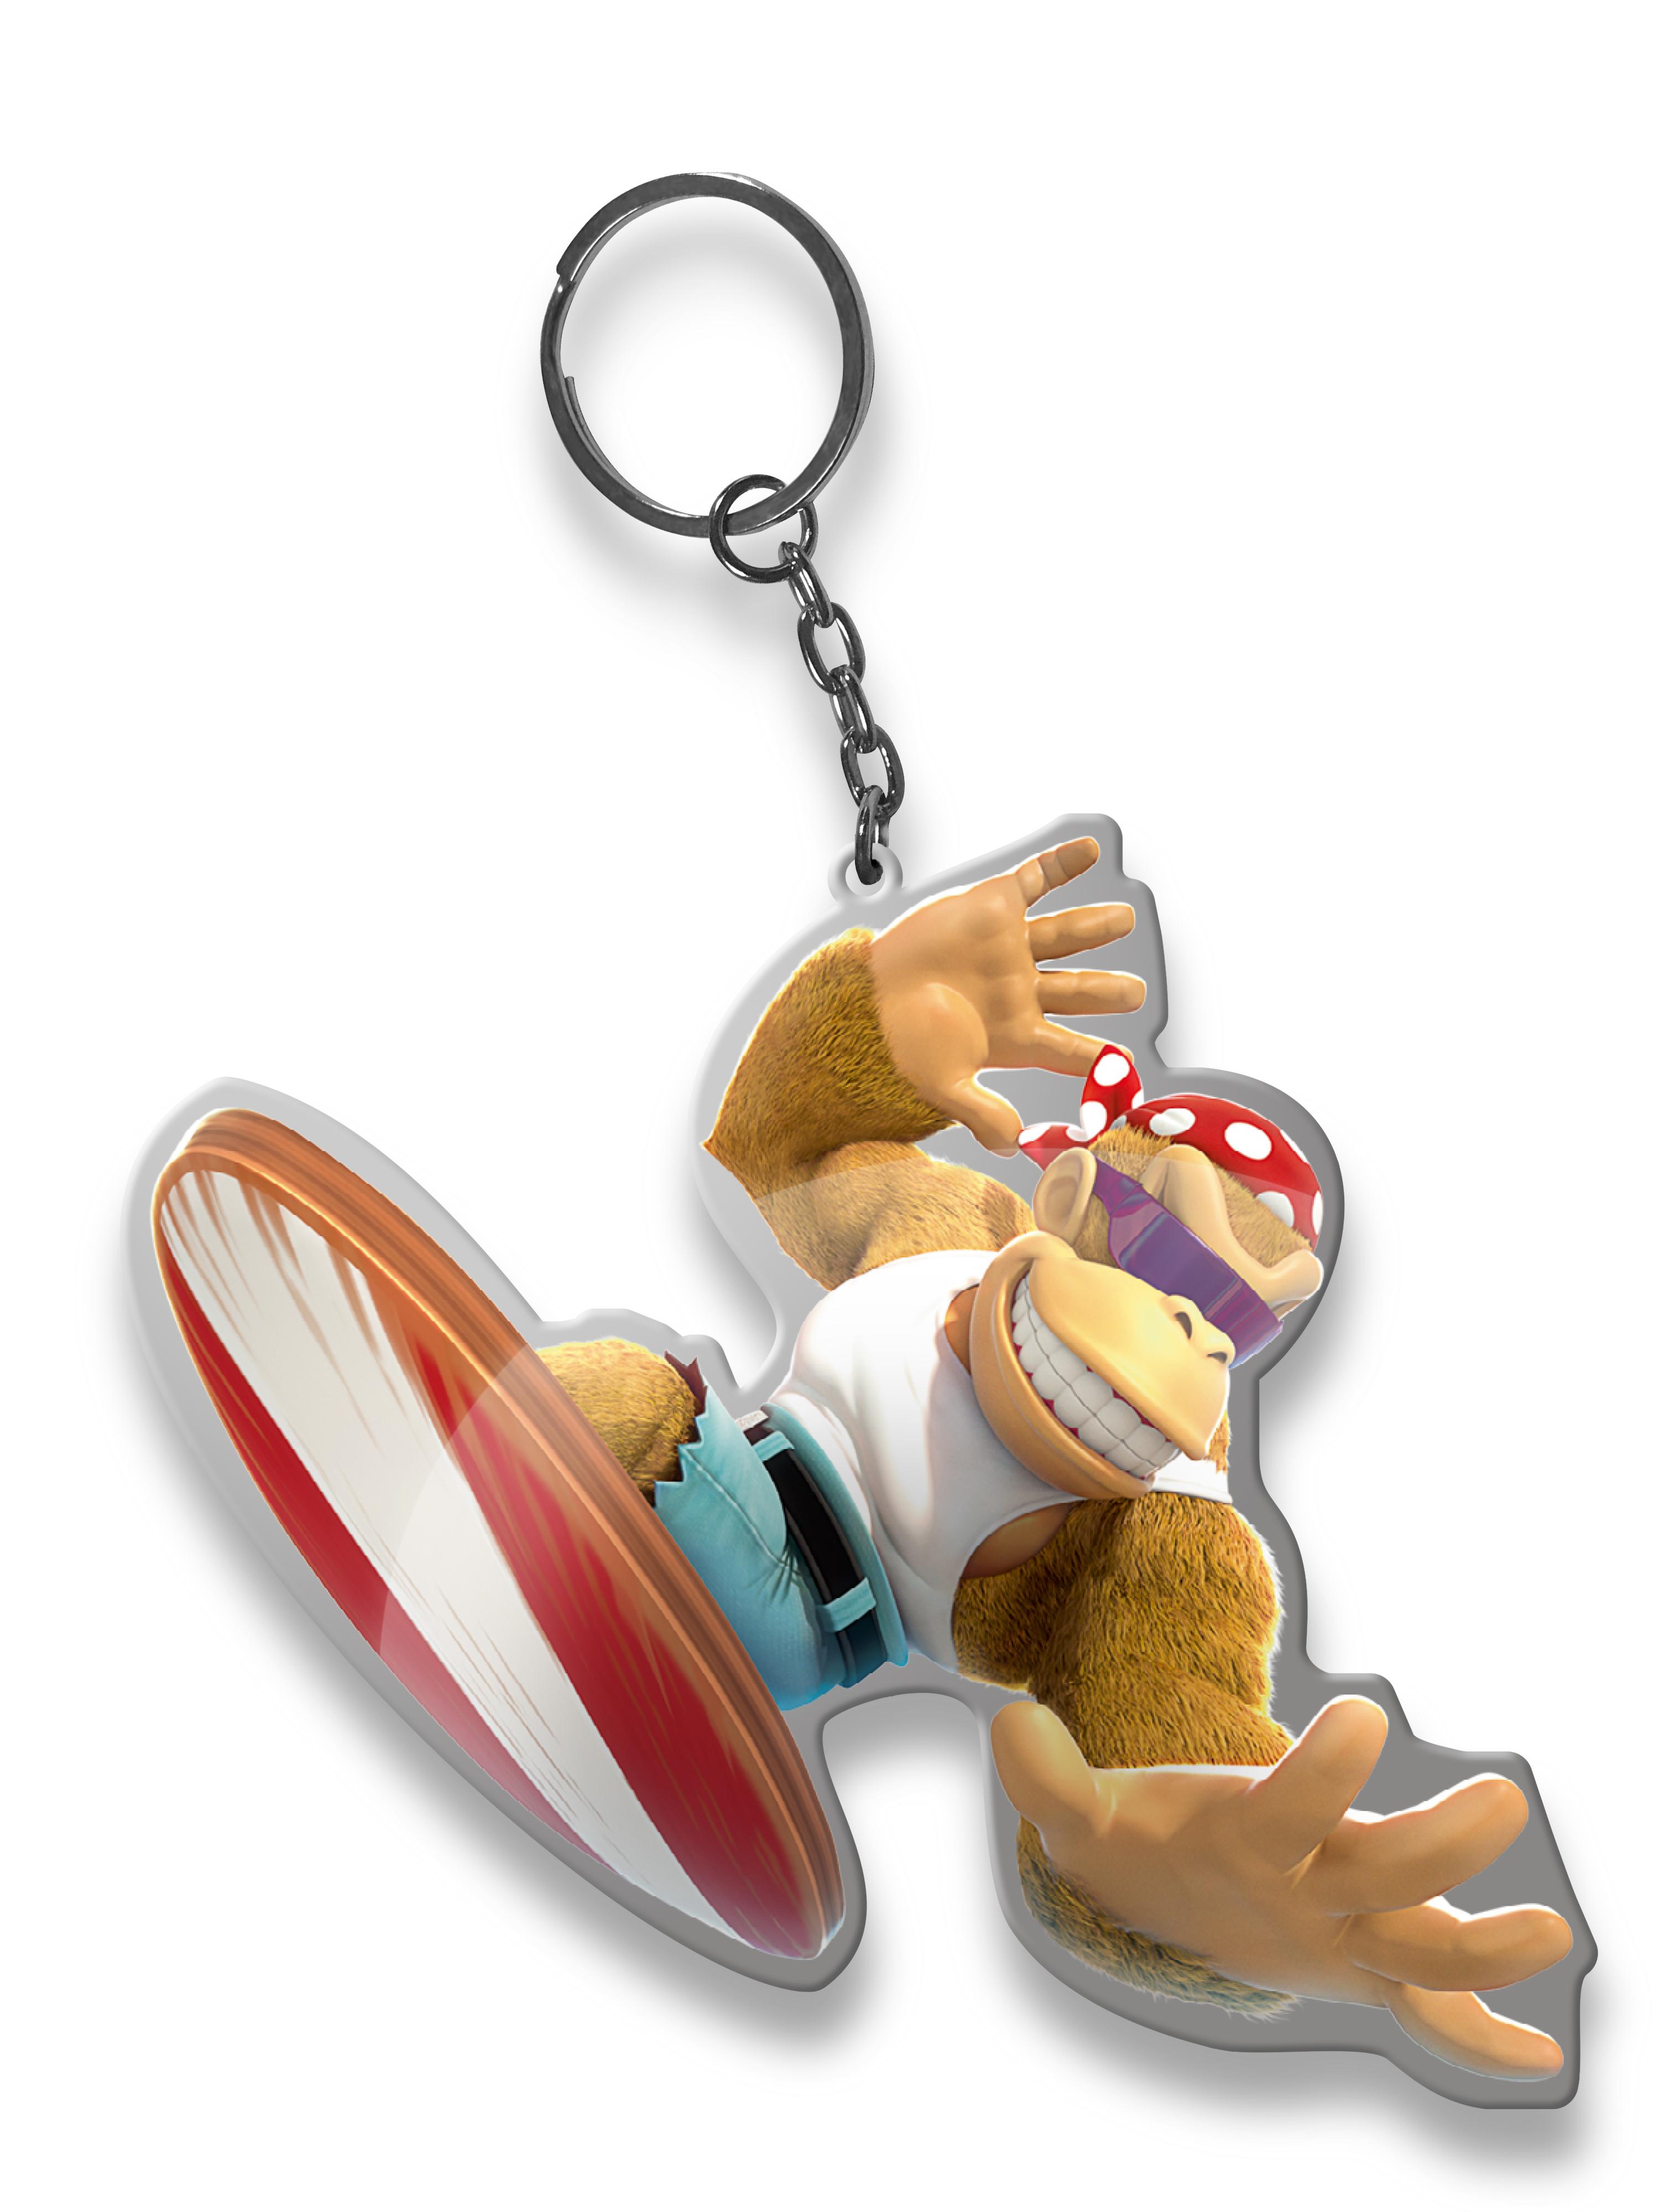 http://www.gamepark.hu/image/catalog/mappa/Donkey_Kong_Keyring.jpg